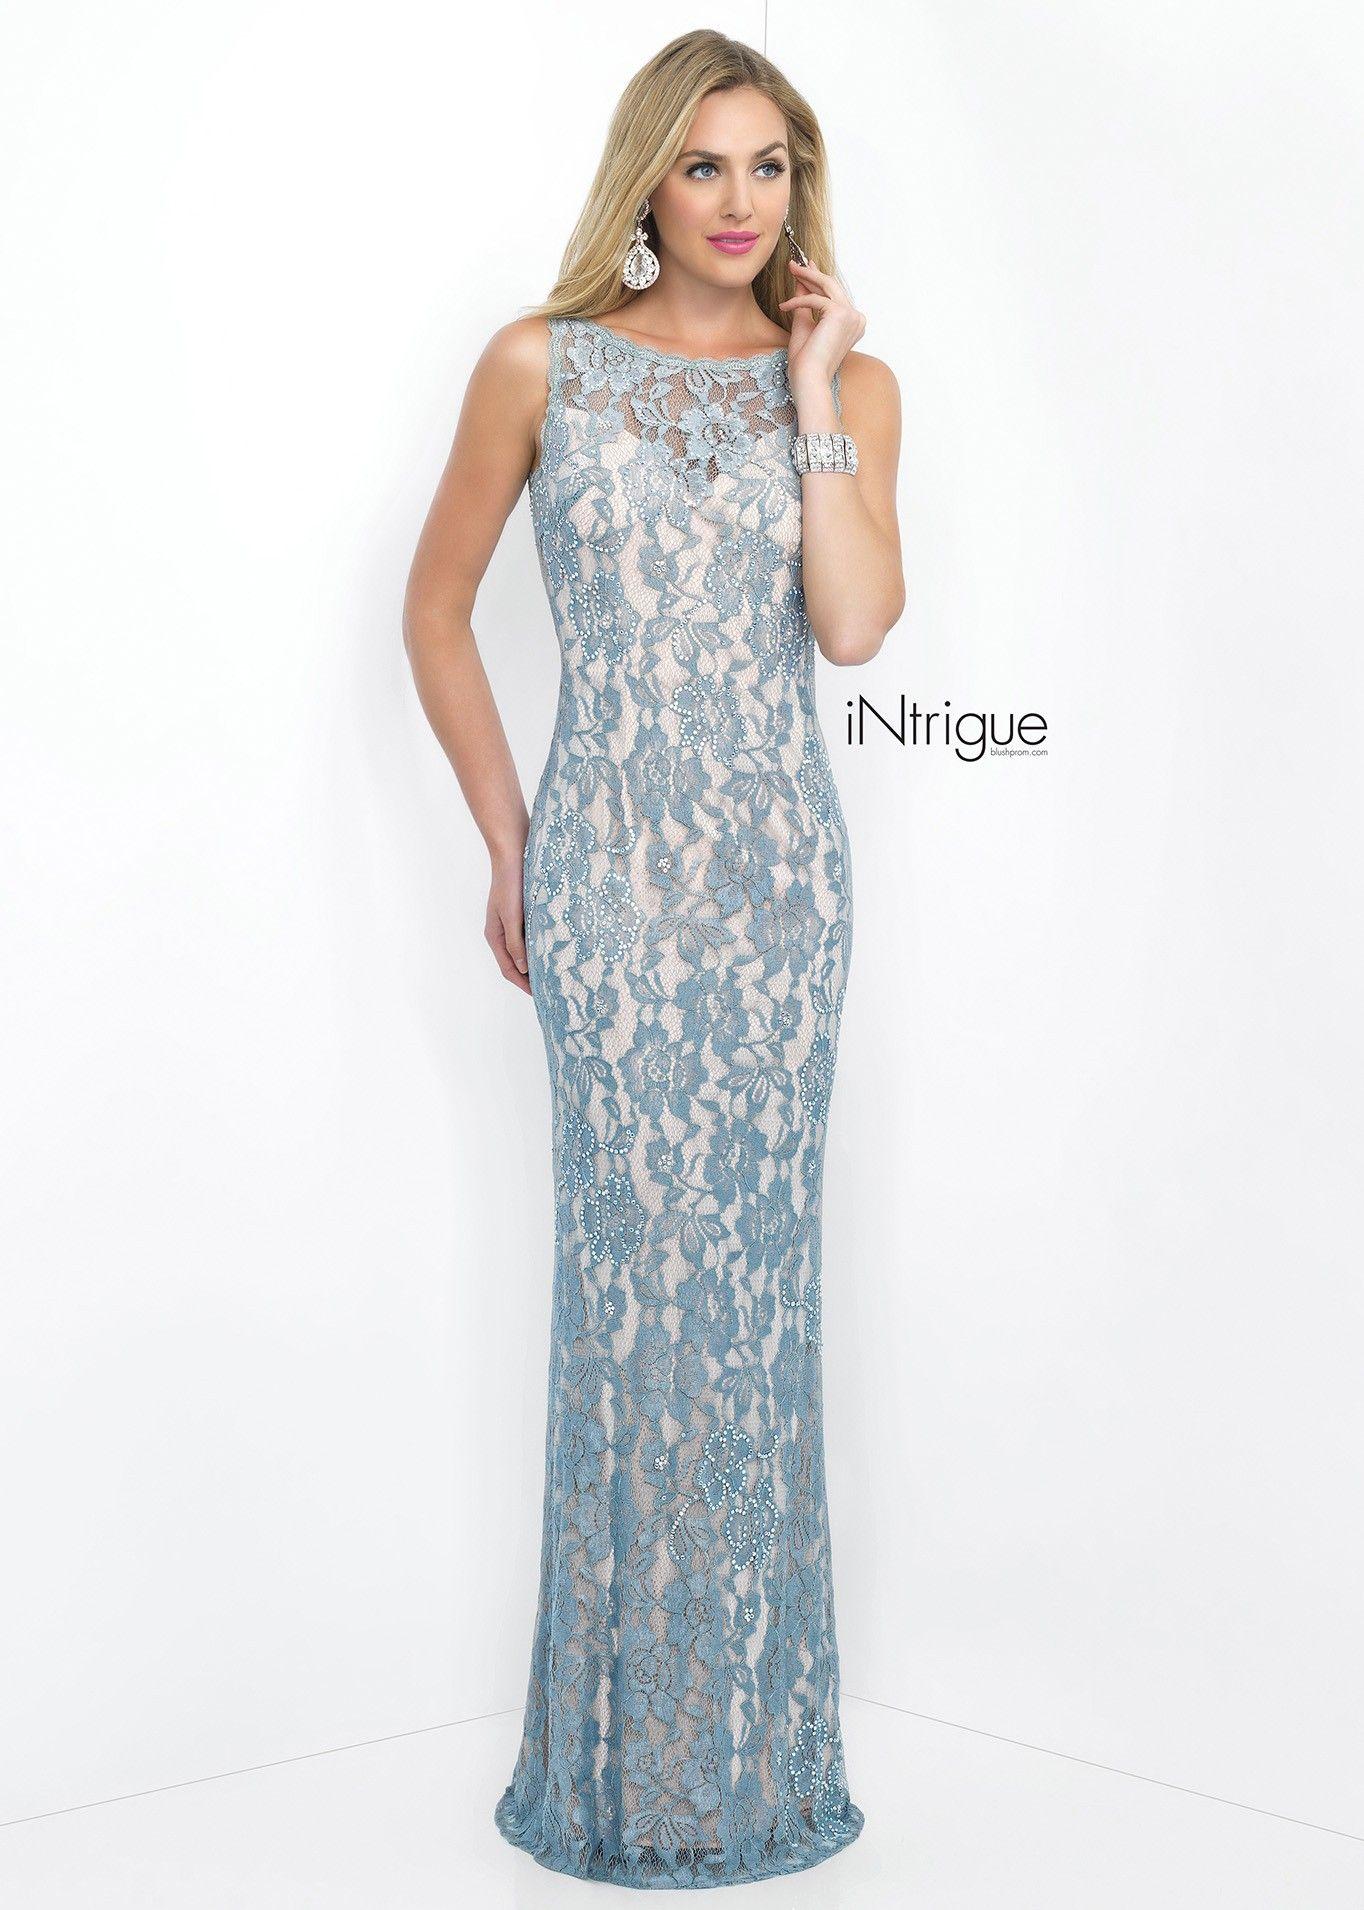 Intrigue 41 Silver Divine High Neck Sheath Evening Gown | 2016 ...